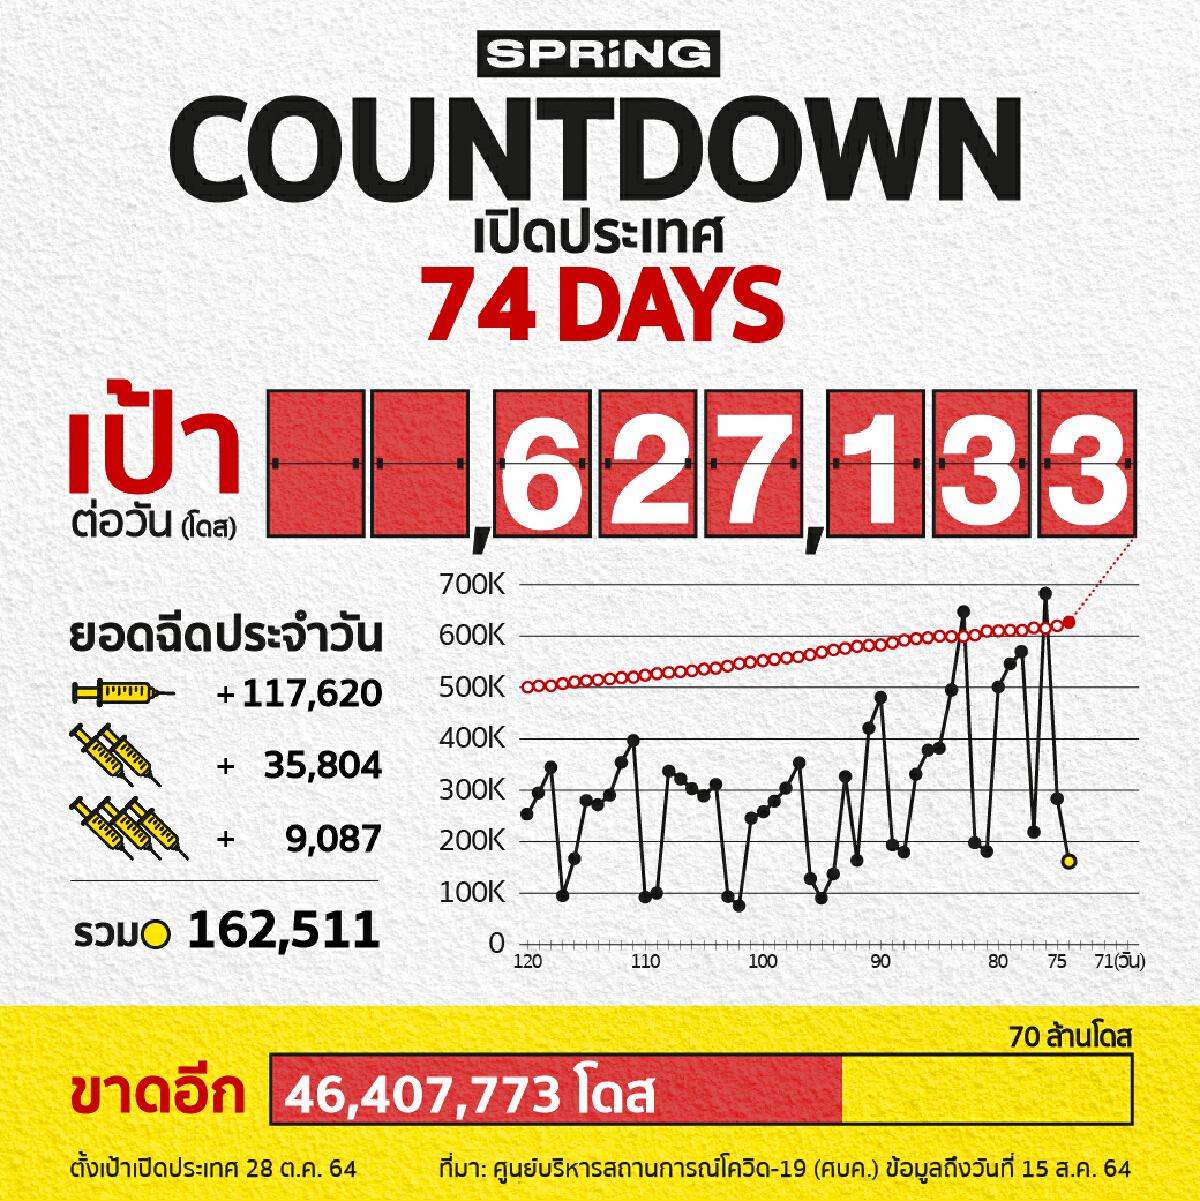 COUNTDOWN! เปิดประเทศใน 74 วัน ฉีดวัคซีนโควิด 162,511 โดส